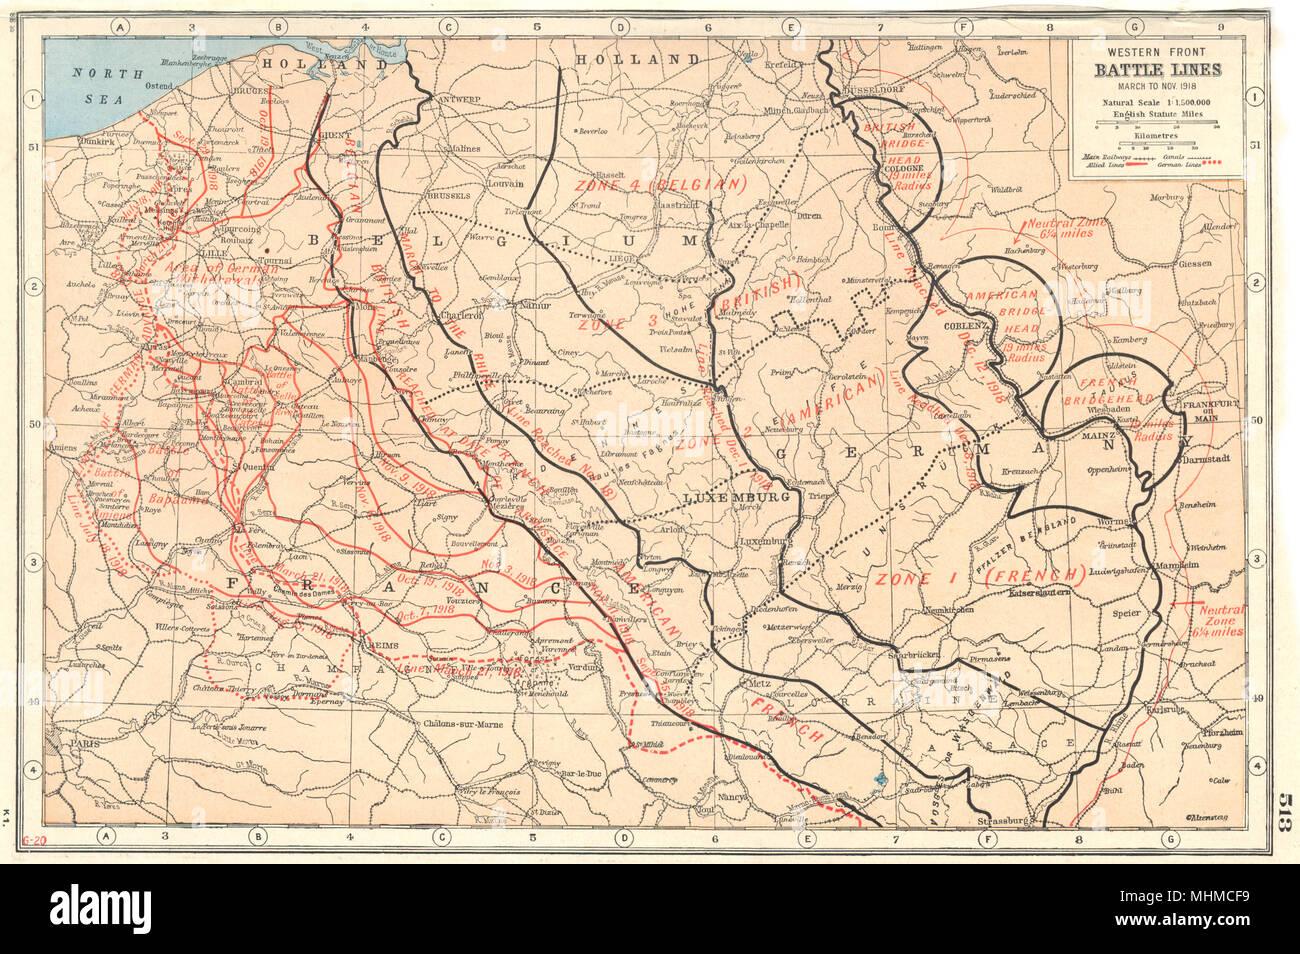 World war 1western front battle lines march nov 1918 belgium world war 1western front battle lines march nov 1918 belgium france 1920 map gumiabroncs Gallery